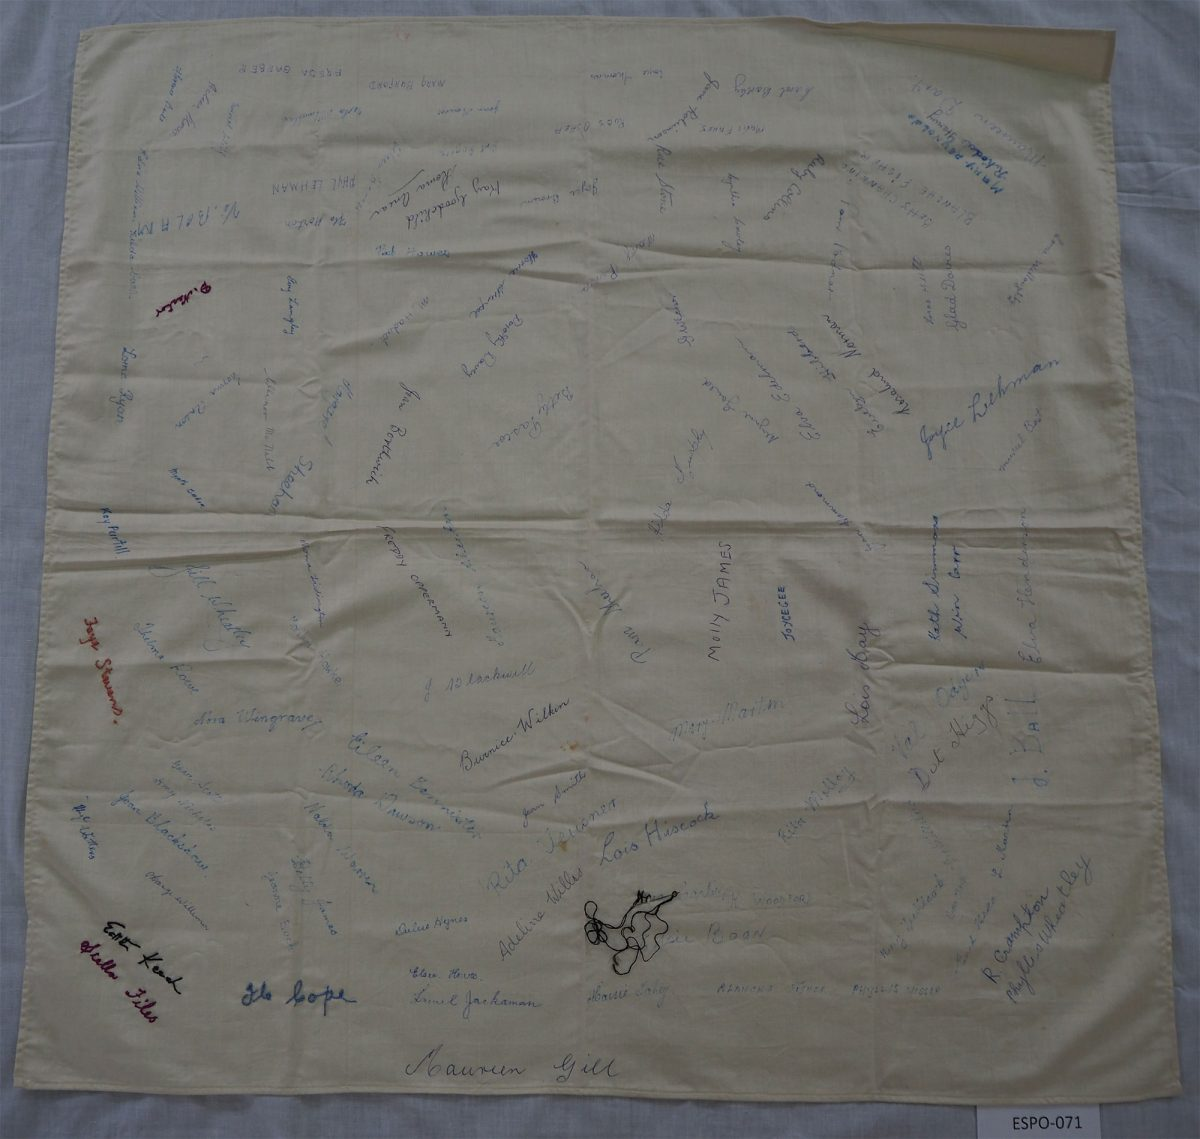 SACWA. Spalding Branch: Cloth